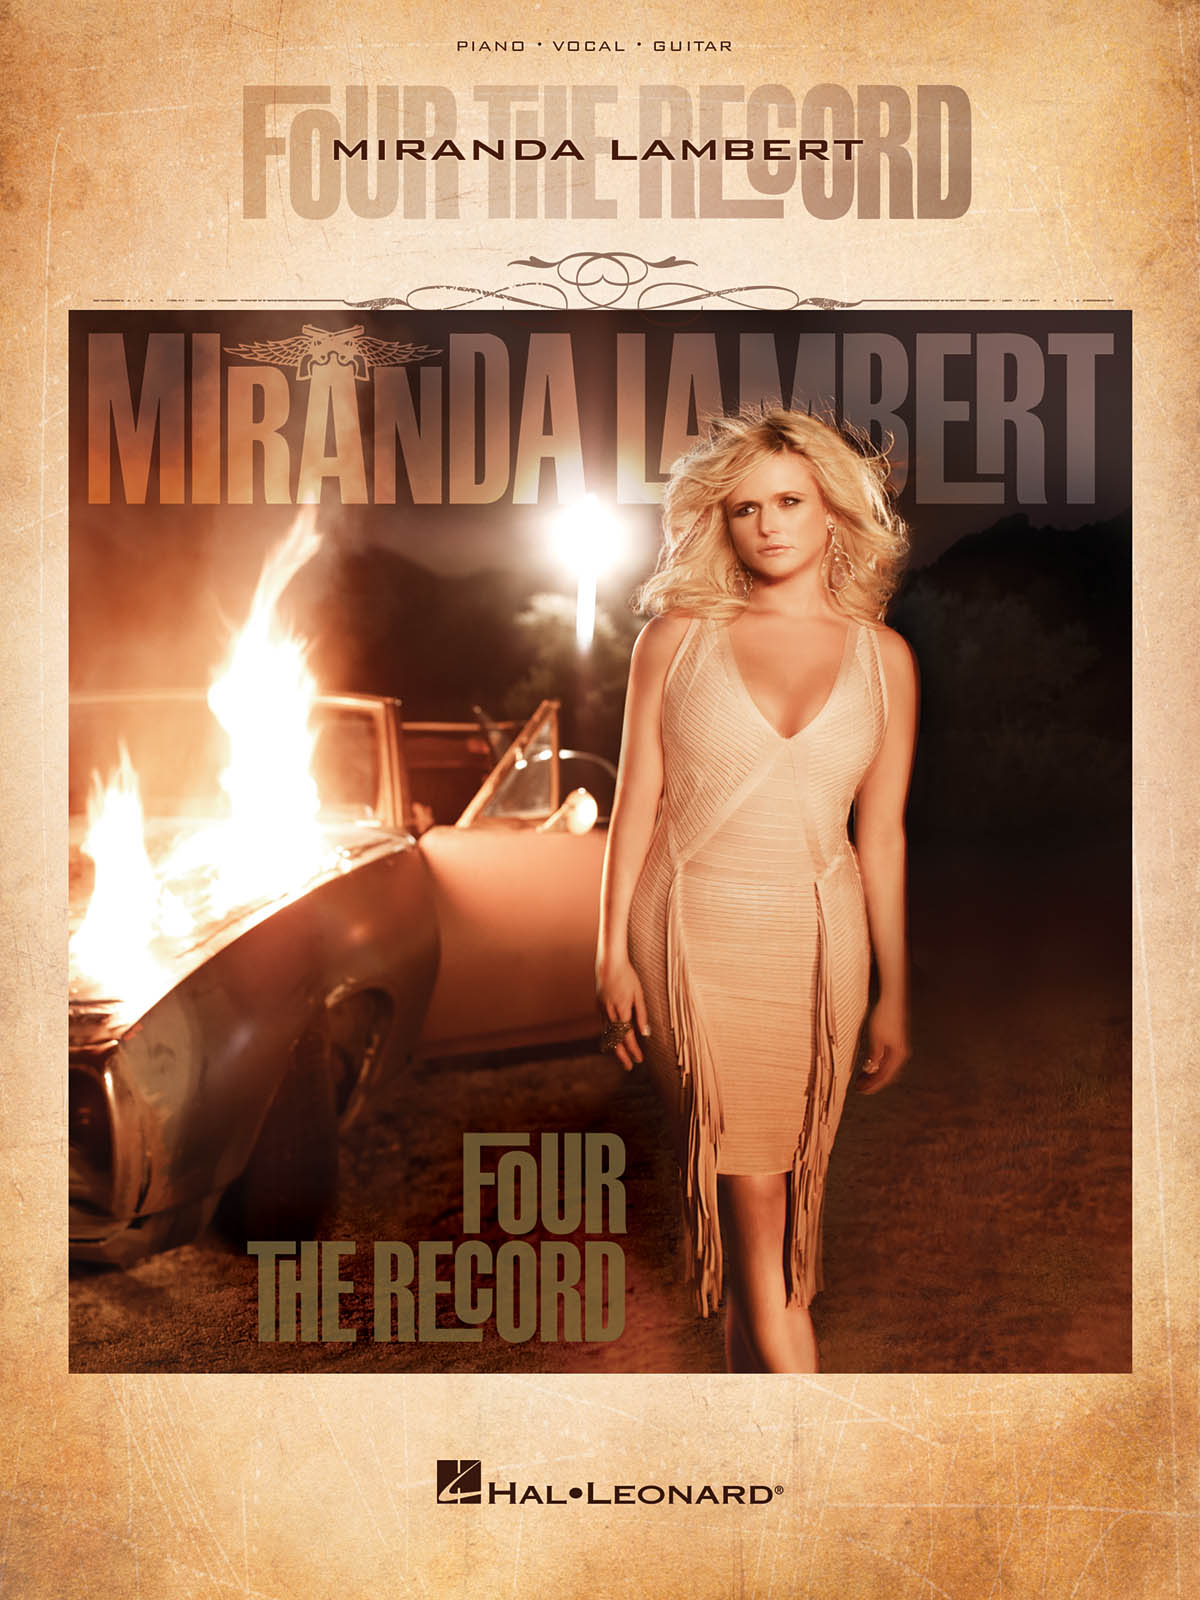 Miranda Lambert: Miranda Lambert Four the Record: Piano  Vocal and Guitar: Album